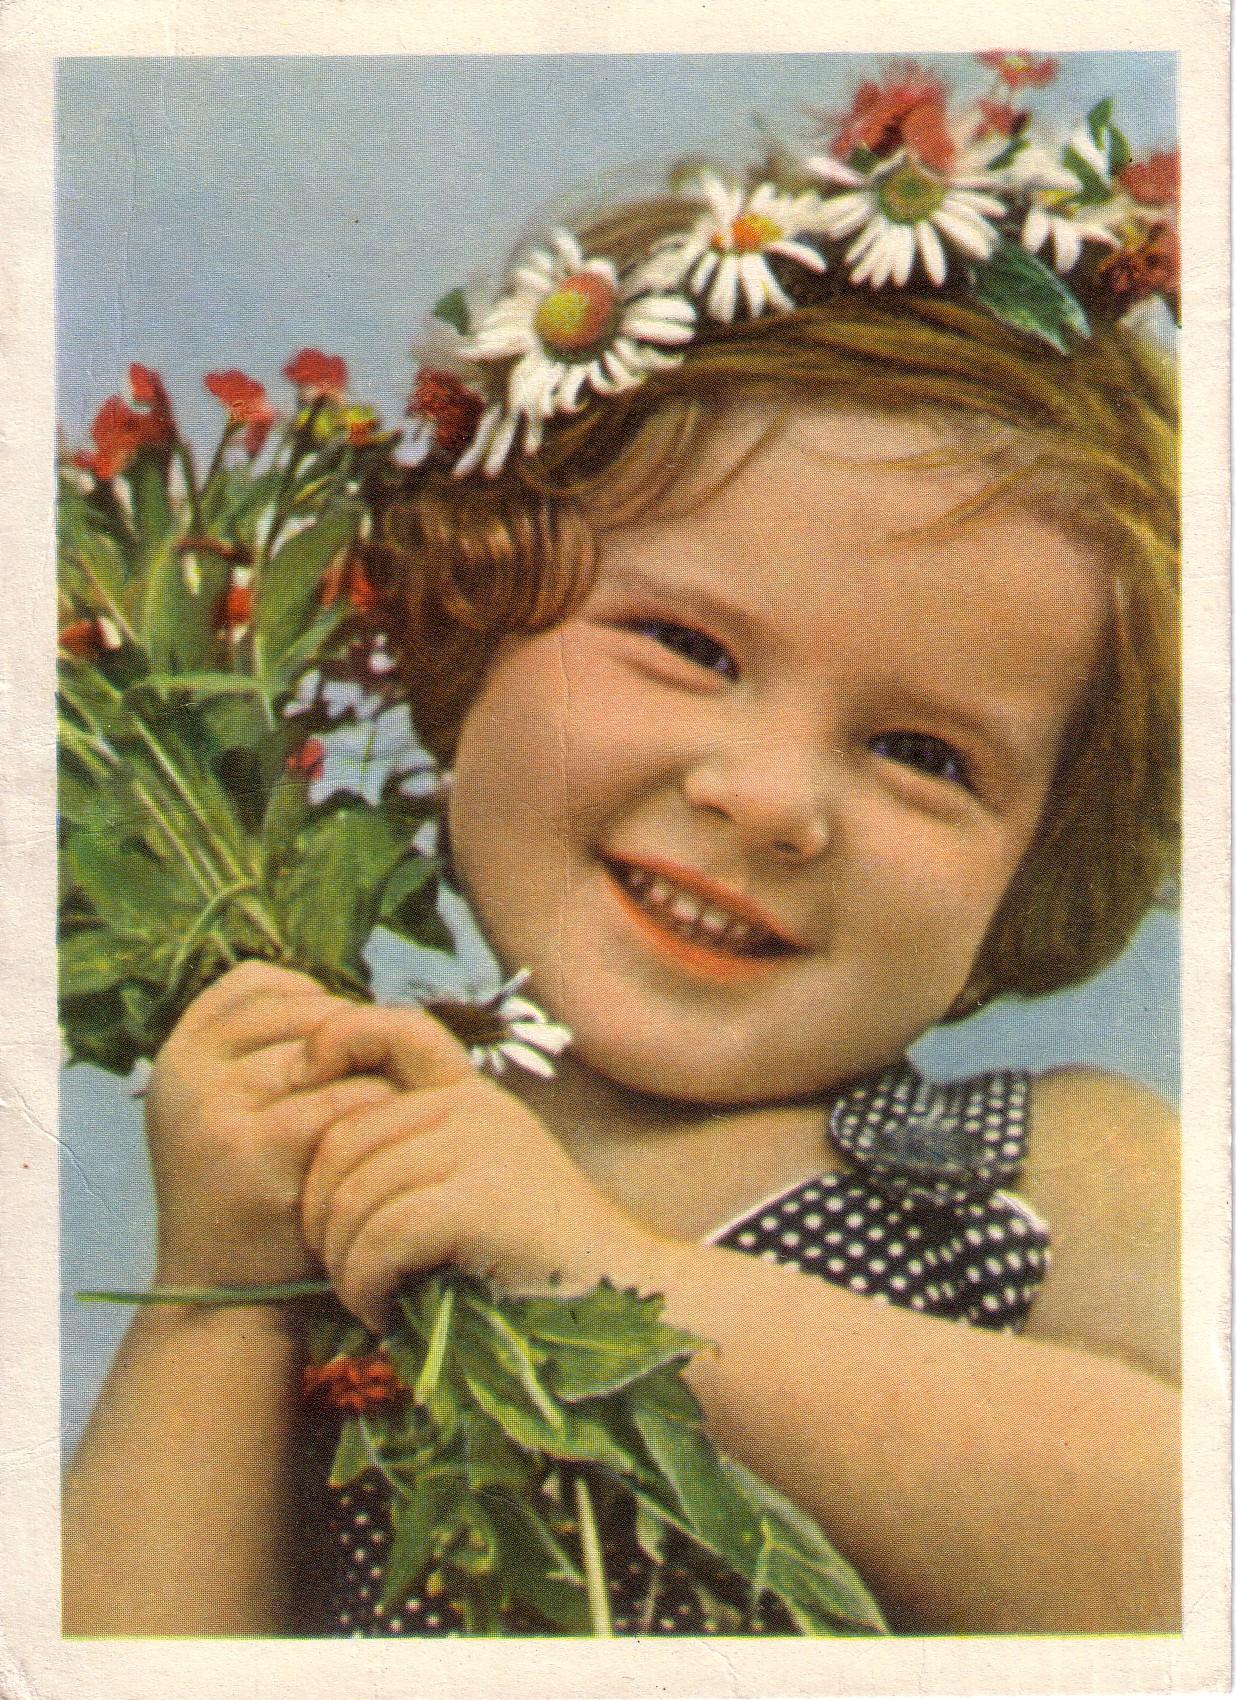 Copy of girl w daisy crown